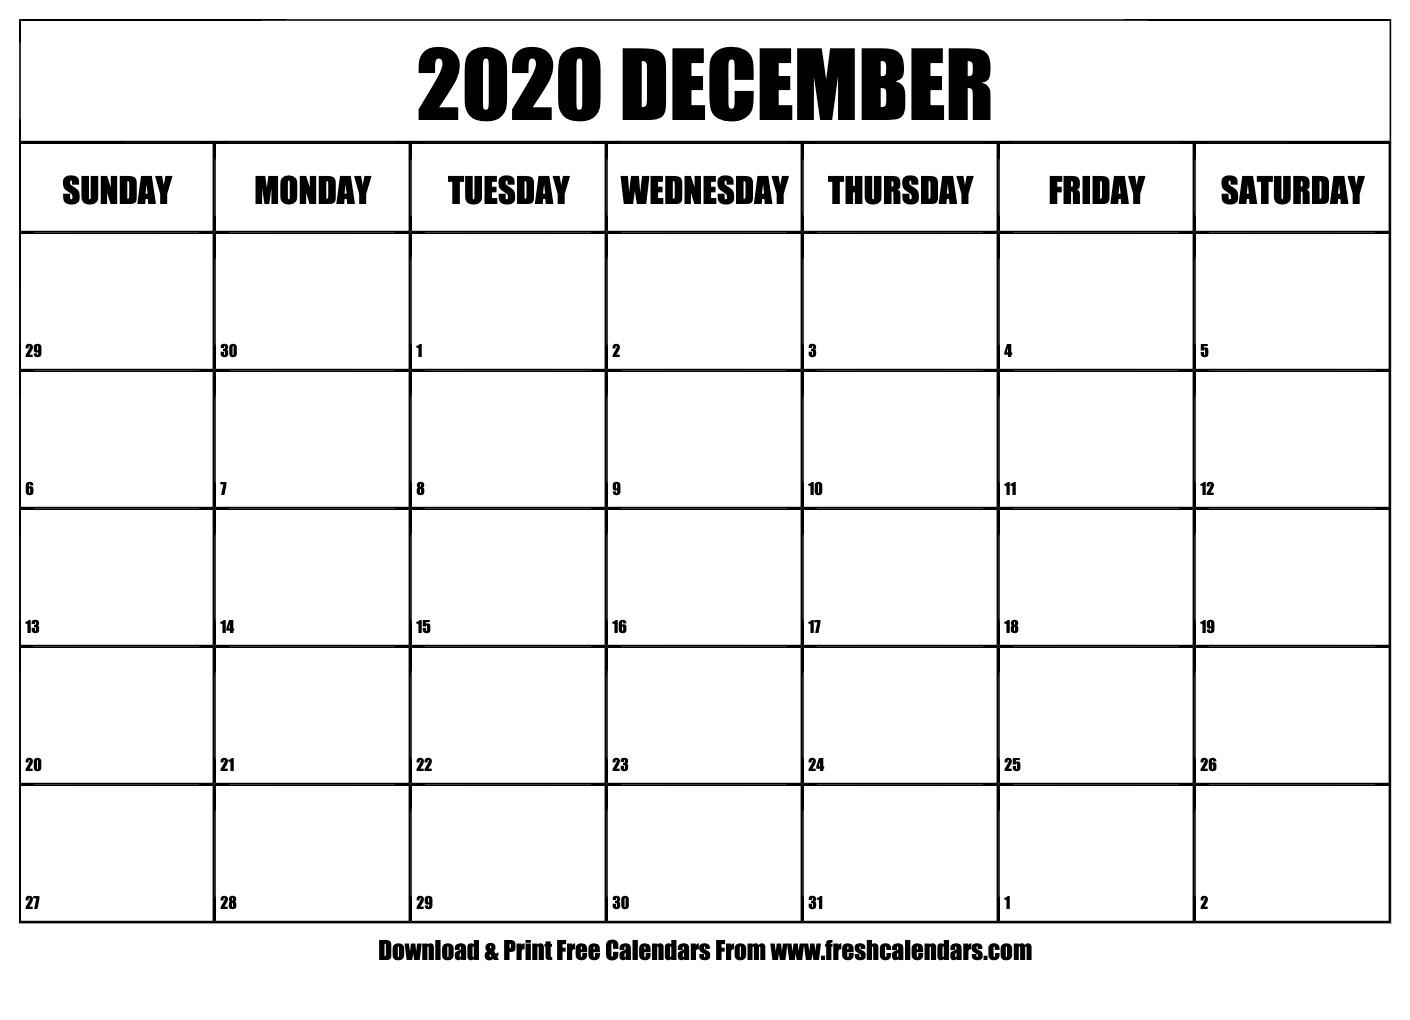 Free Printable December 2020 Calendar with 123 Calendars December 2020